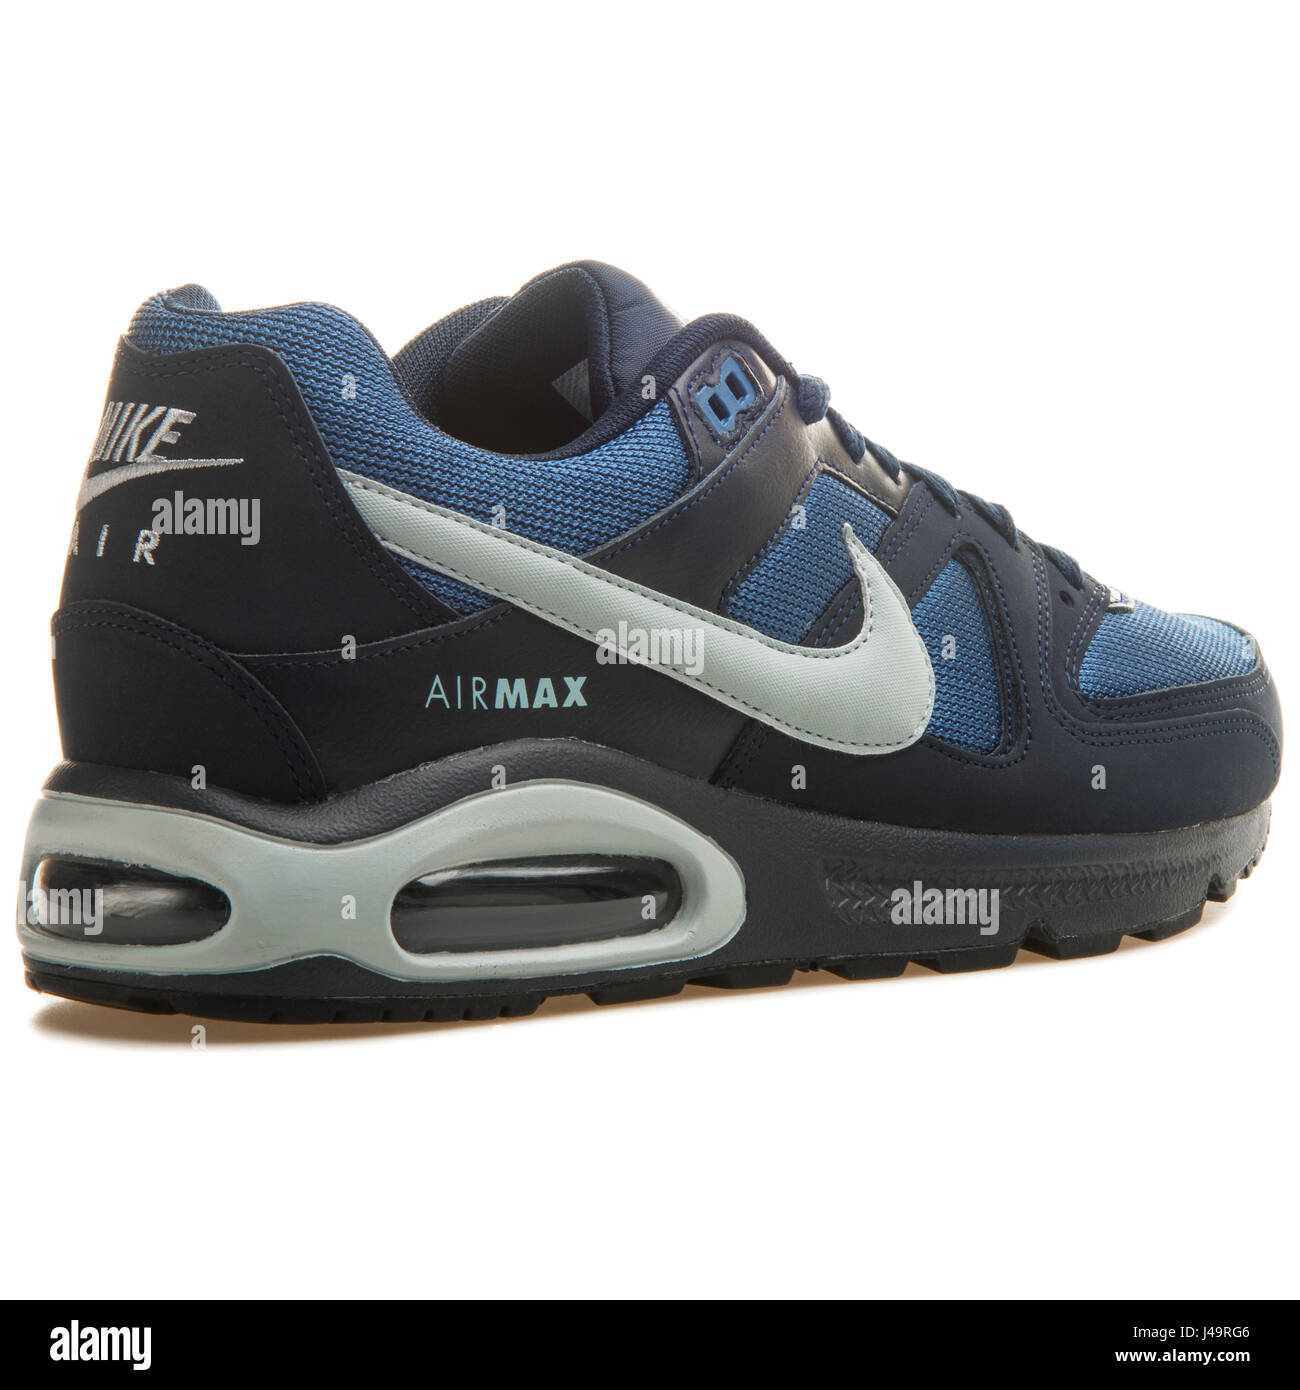 Pin by JP on New | Nike air max command, Air max, Nike air